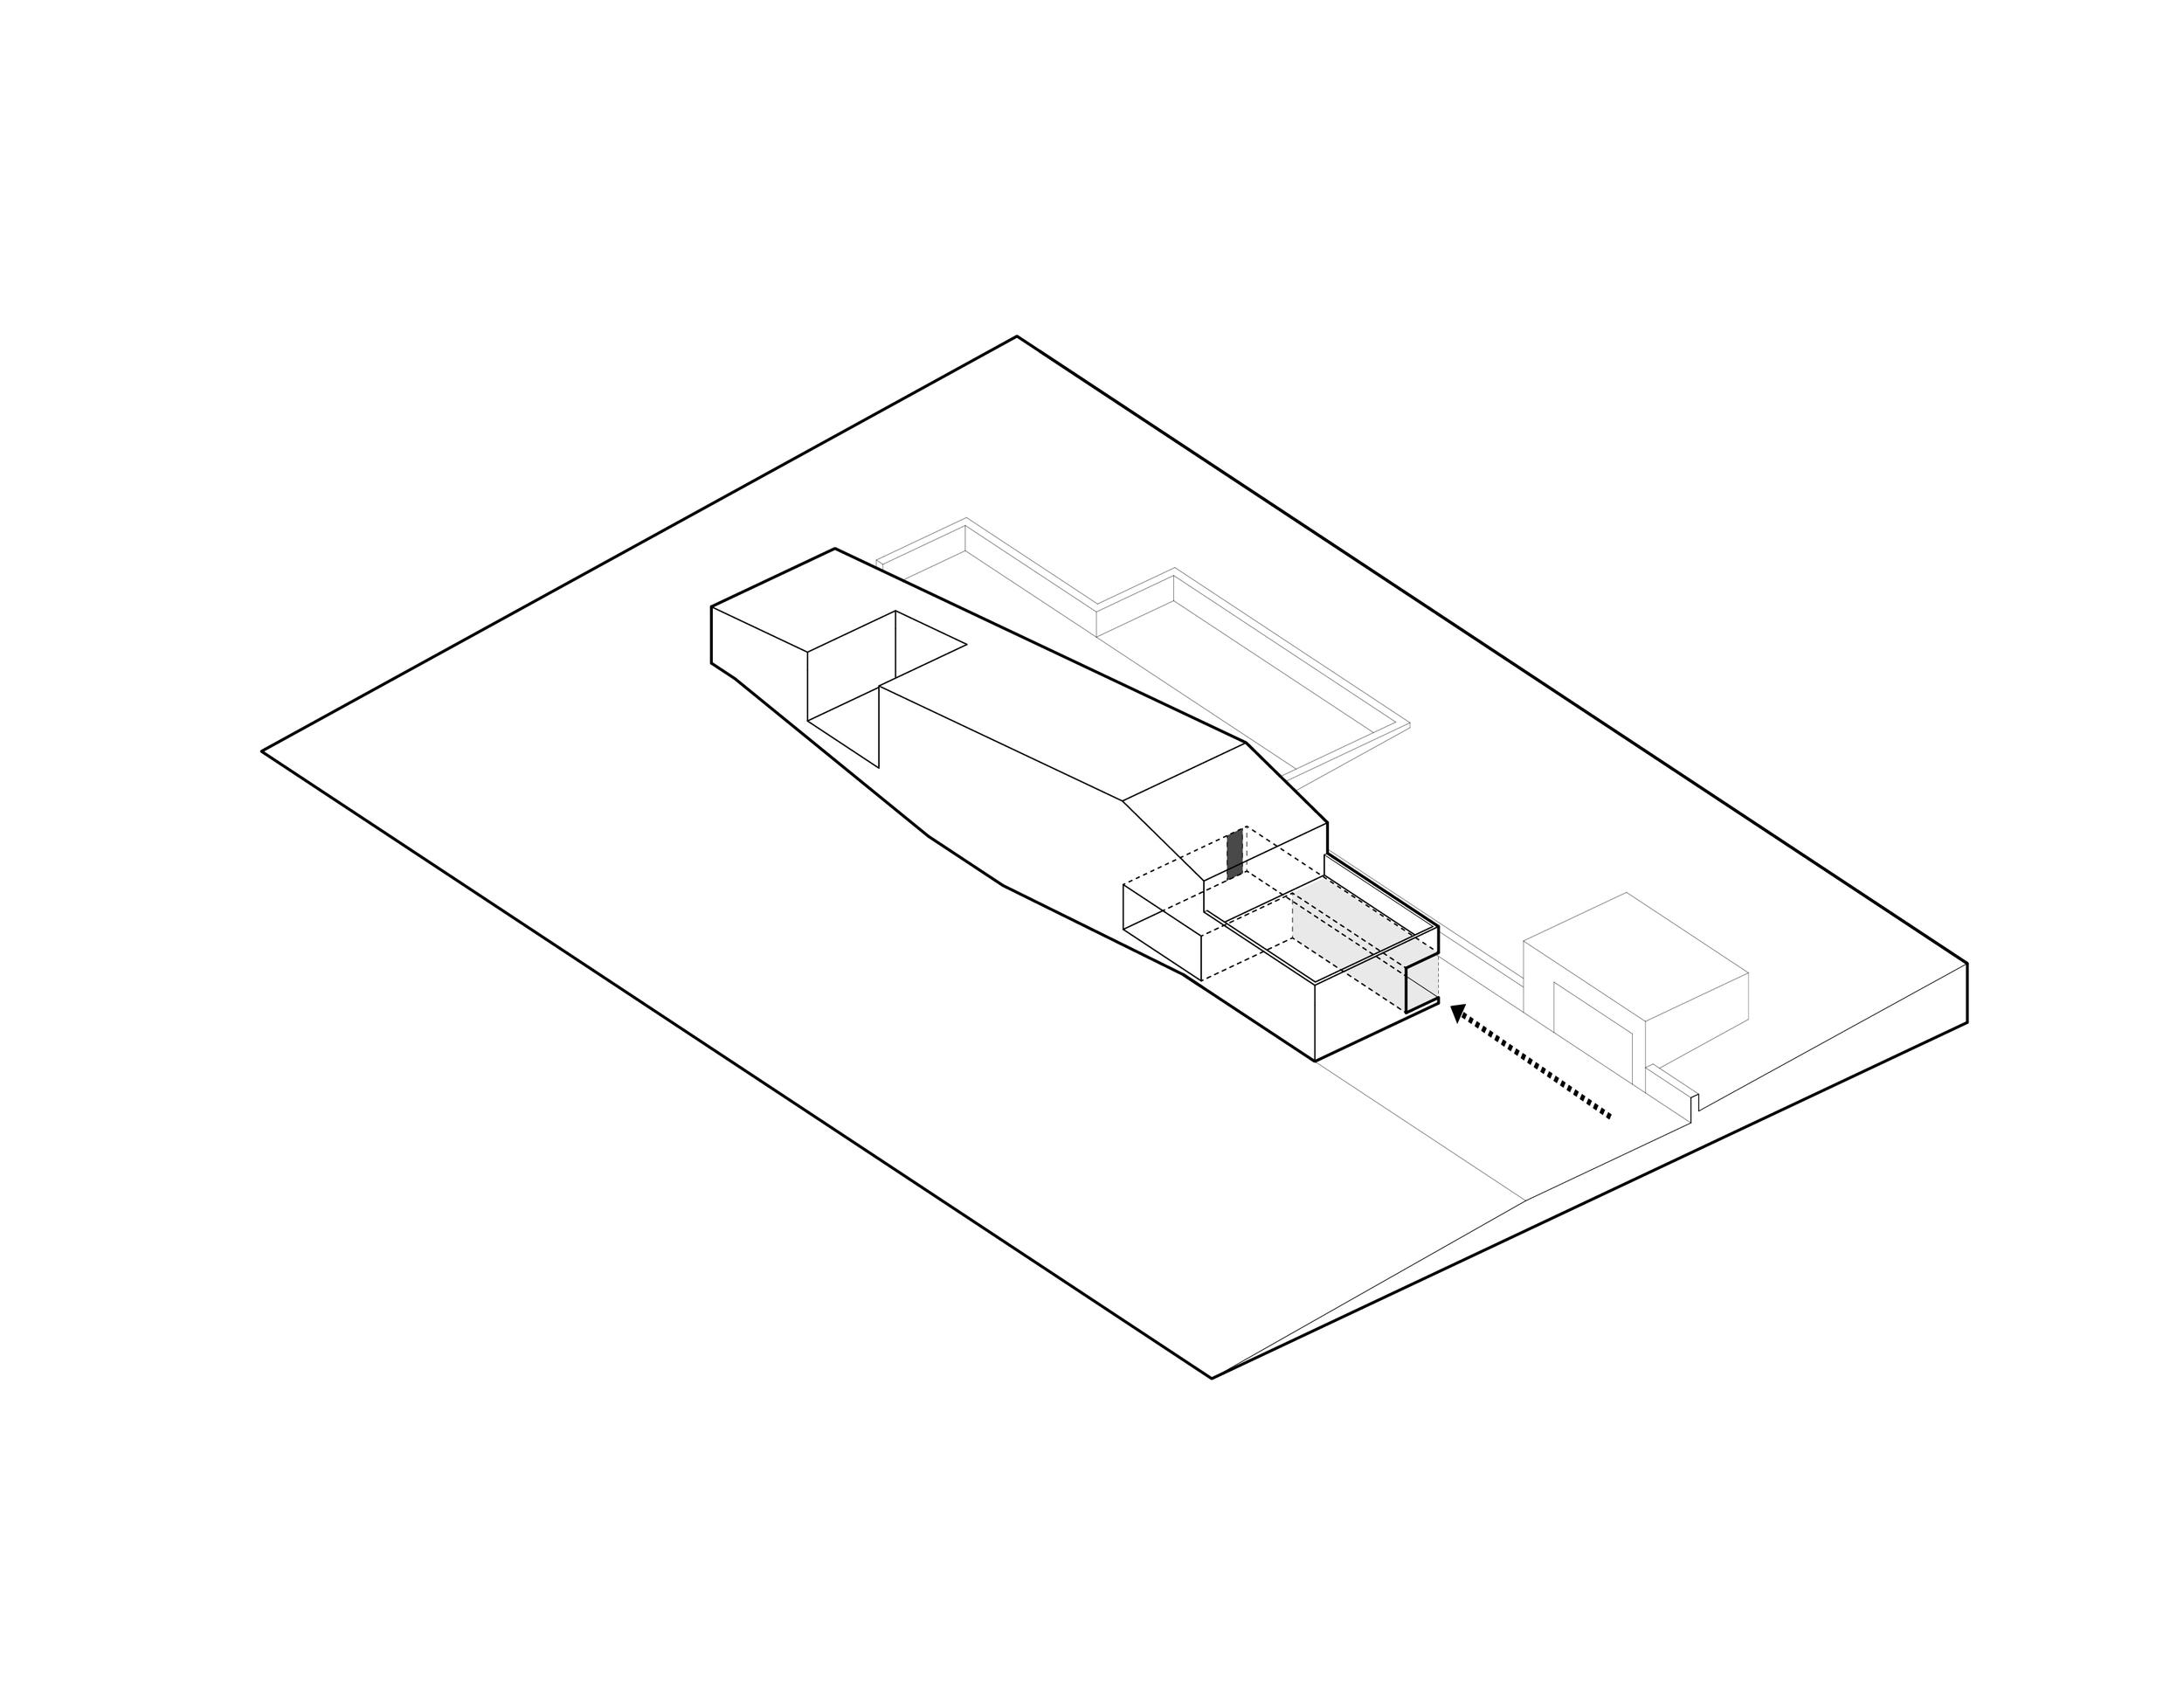 1407_08_Diagrams_Entry-01-01.jpg